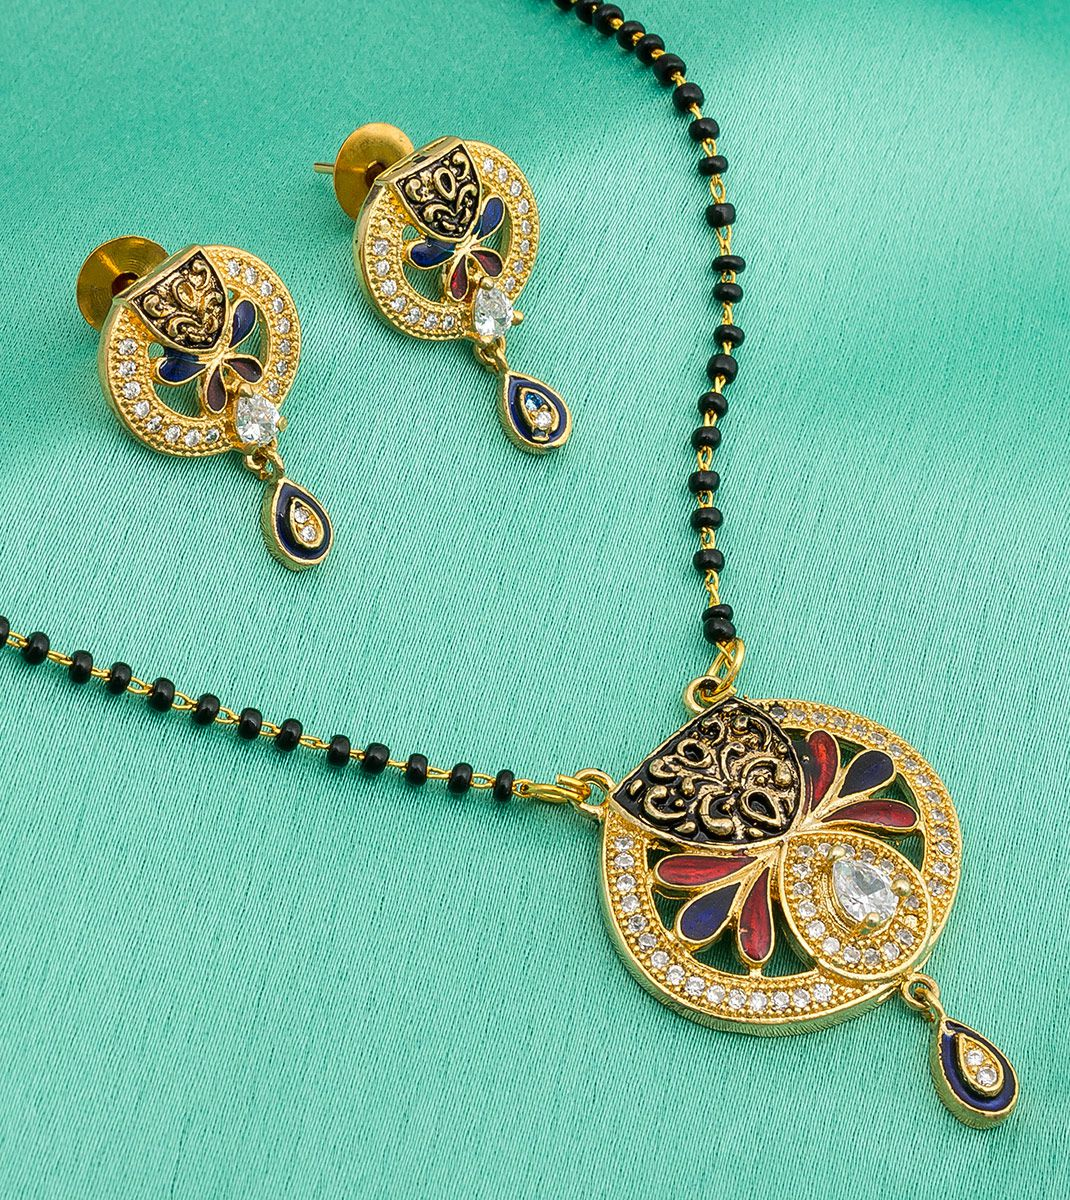 The Luxor Designer Gold Tone American Diamond Black Bead Stylish Mangalsutra Set for Women with Earrings